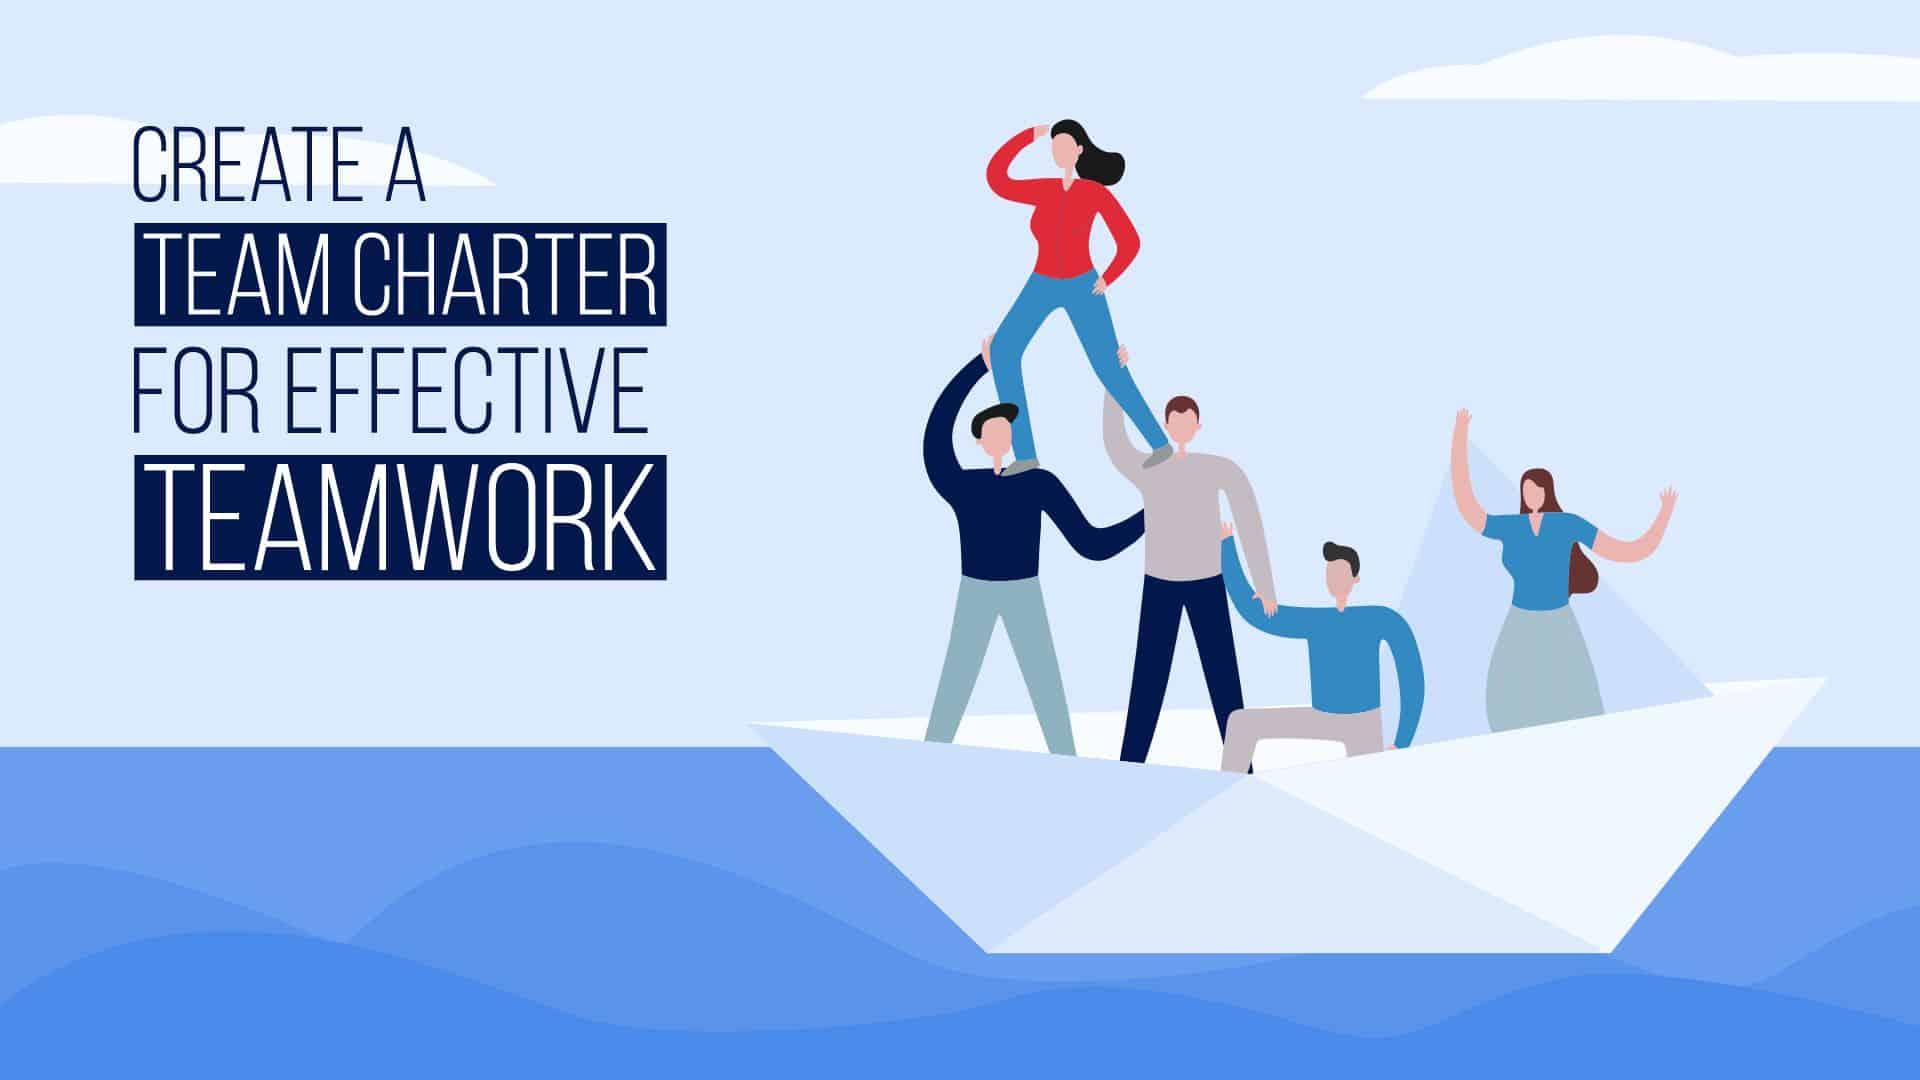 Create A Team Charter For Effective Teamwork